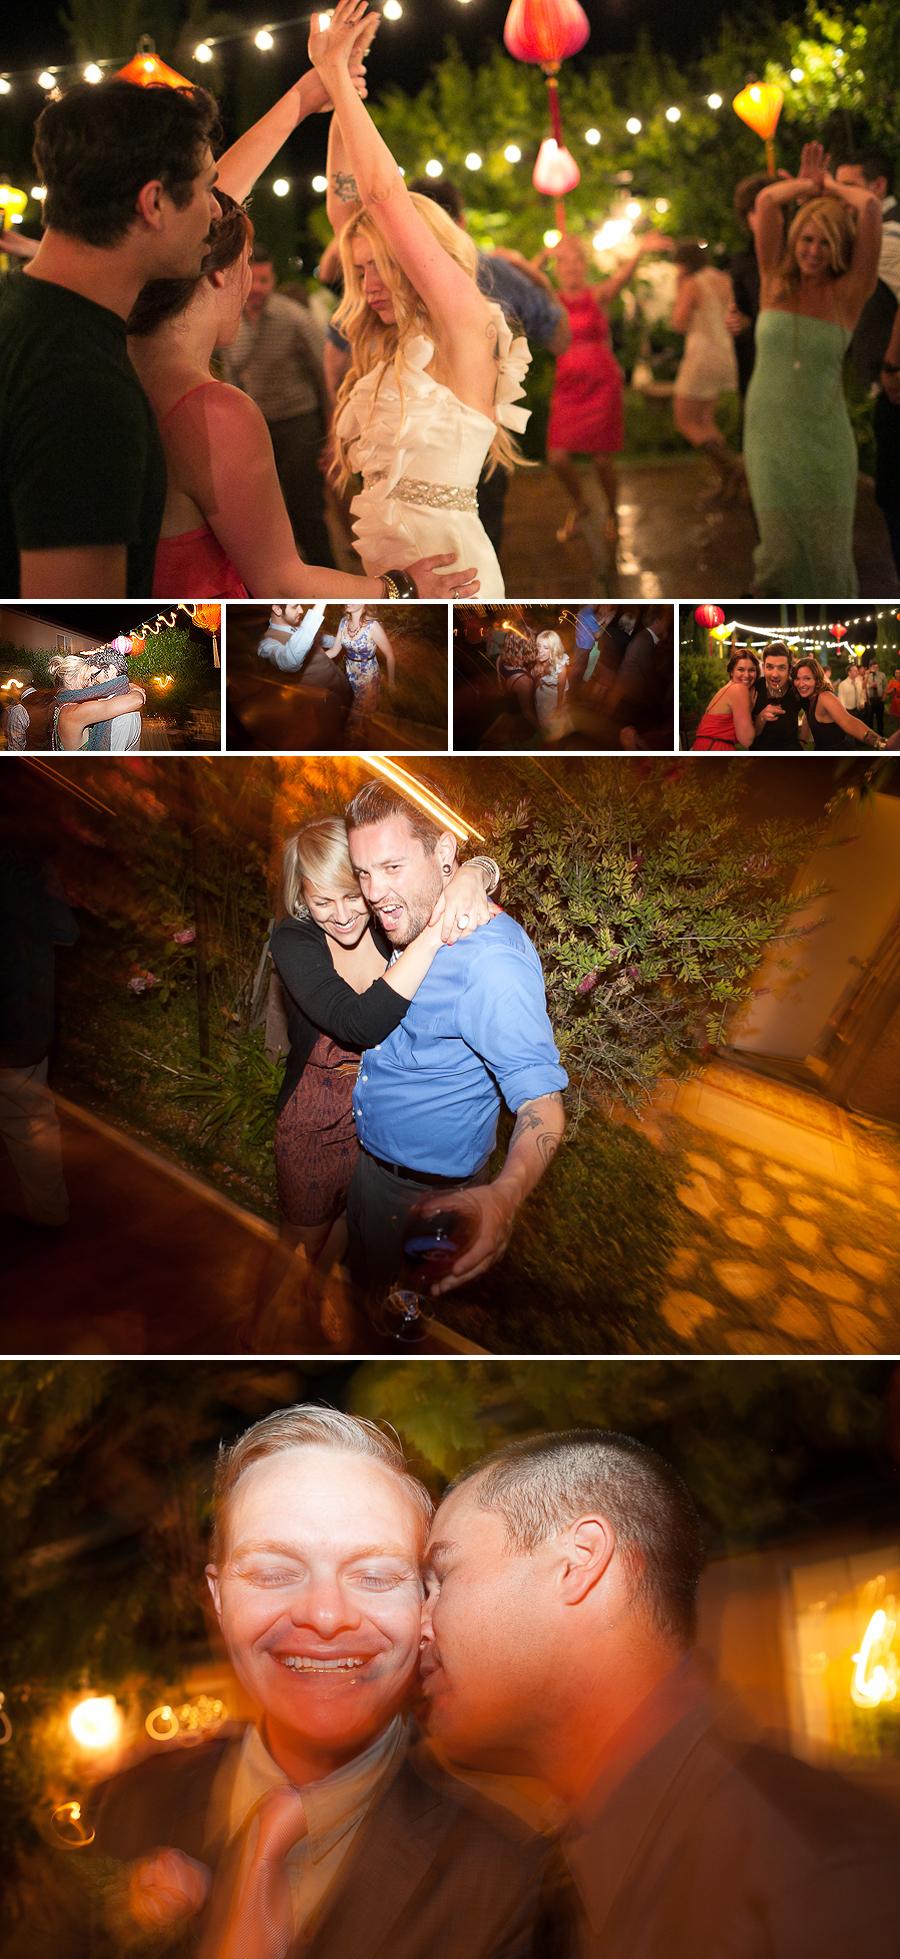 hanging lantern wedding decor, candlelit reception,  paso robles wedding, central coast wedding photographer, southern california fine art wedding photographer, vintage wedding, western themed wedding, victorian themed wedding, ranch wedding, farm wedding, fine art wedding photography, fine art wedding photographer, photography similar to jose villa